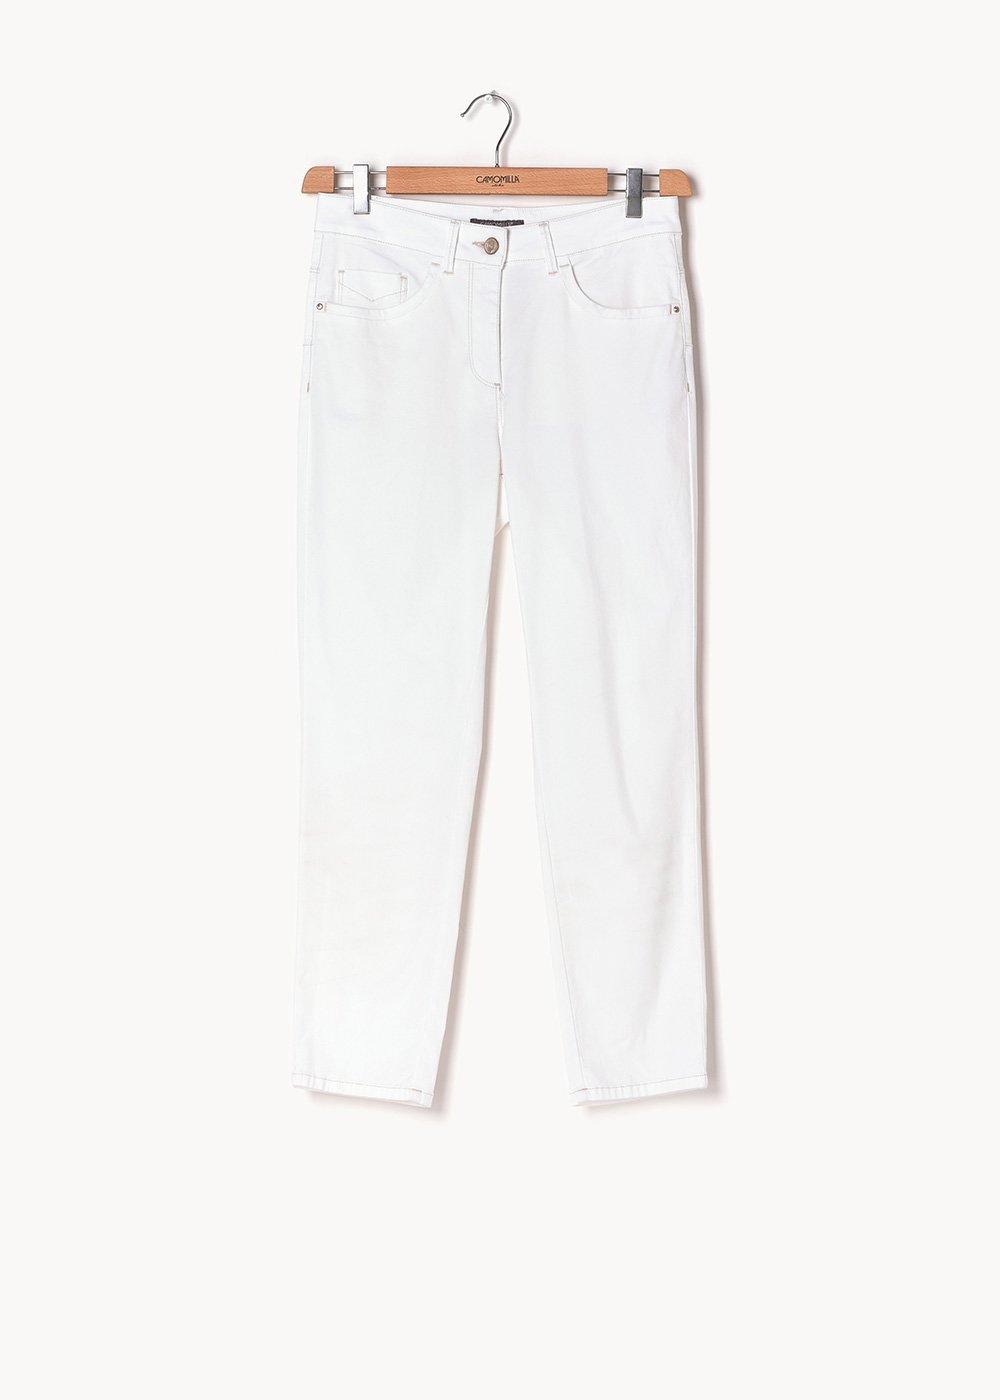 Priamo honeycomb cotton trousers - White - Woman